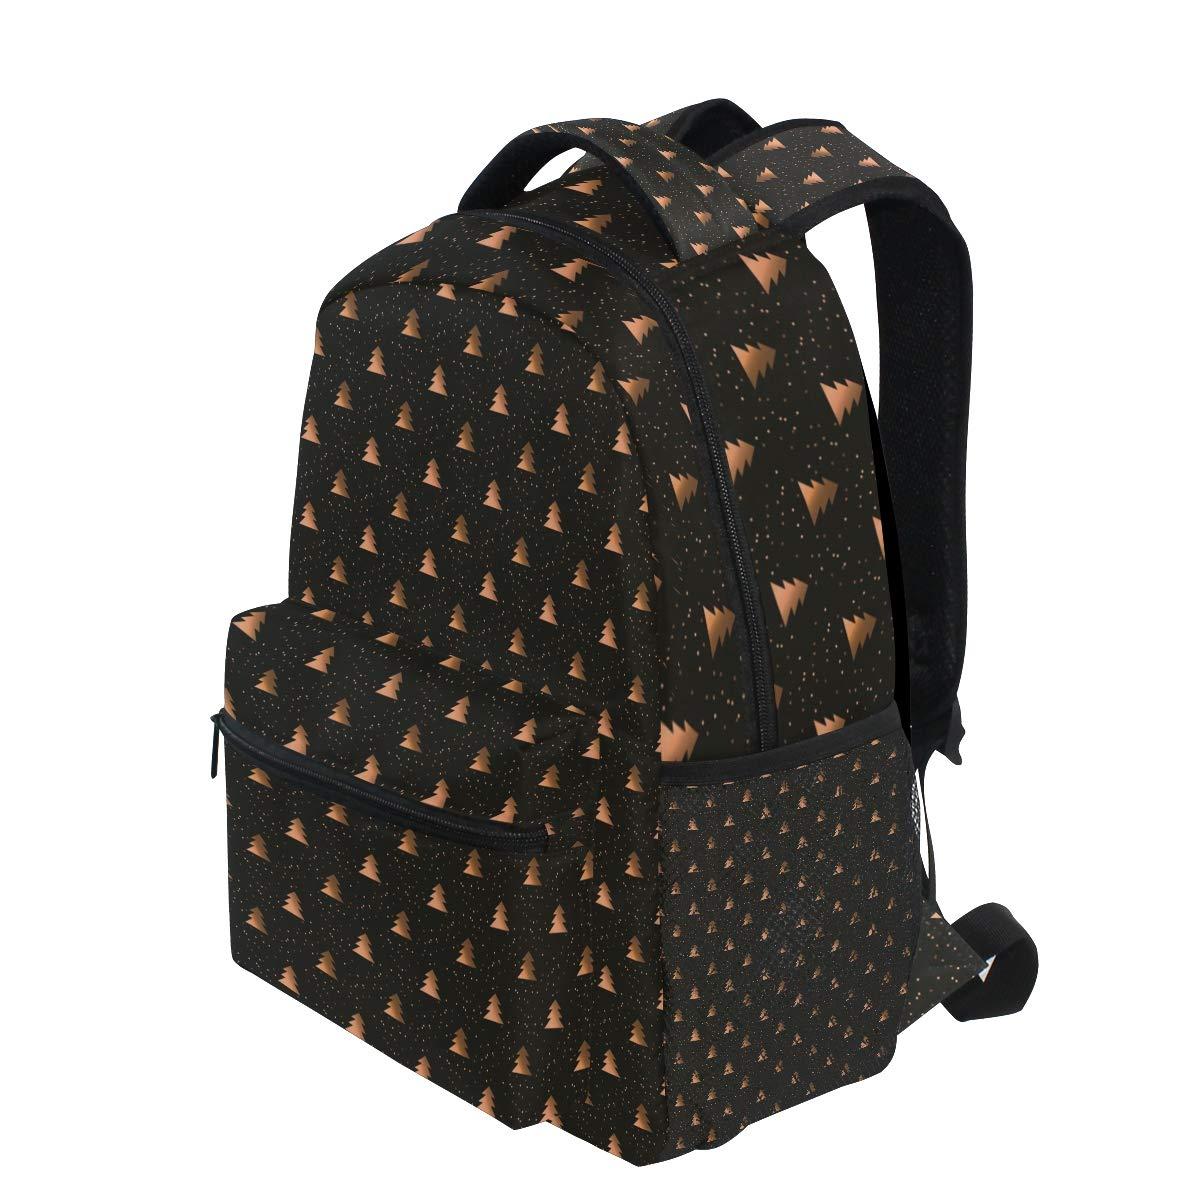 bcb0cede5d Amazon.com  Golden Cute Christmas Tree Black Student Backpack